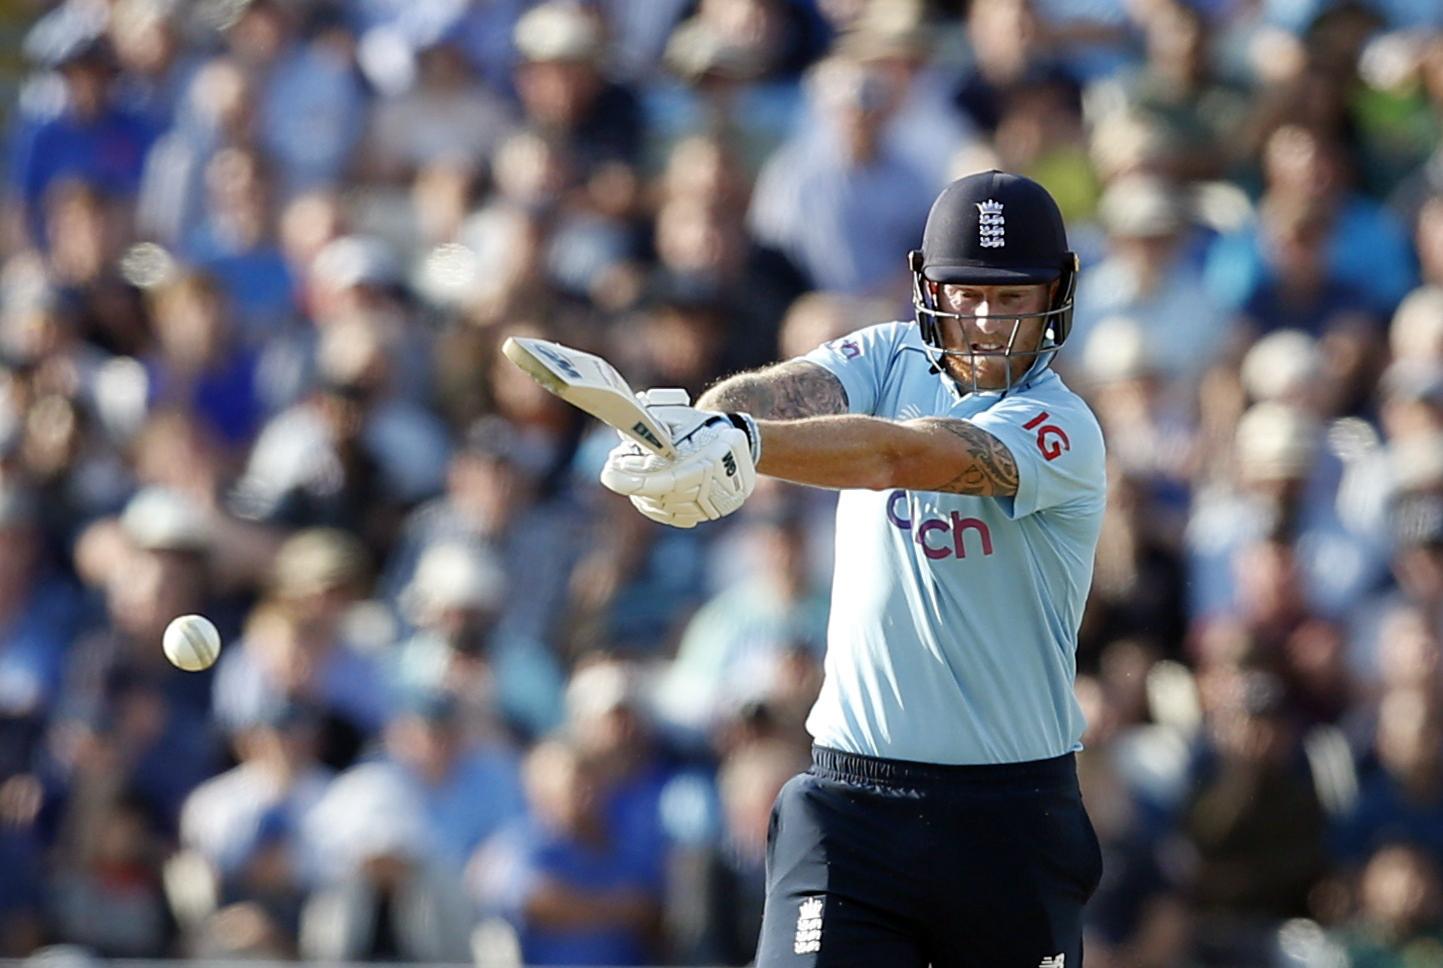 Cricket - Third One Day International - England v Pakistan - Edgbaston Stadium, Birmingham, Britain - July 13, 2021 England's Ben Stokes in action Action Images via Reuters/Ed Sykes